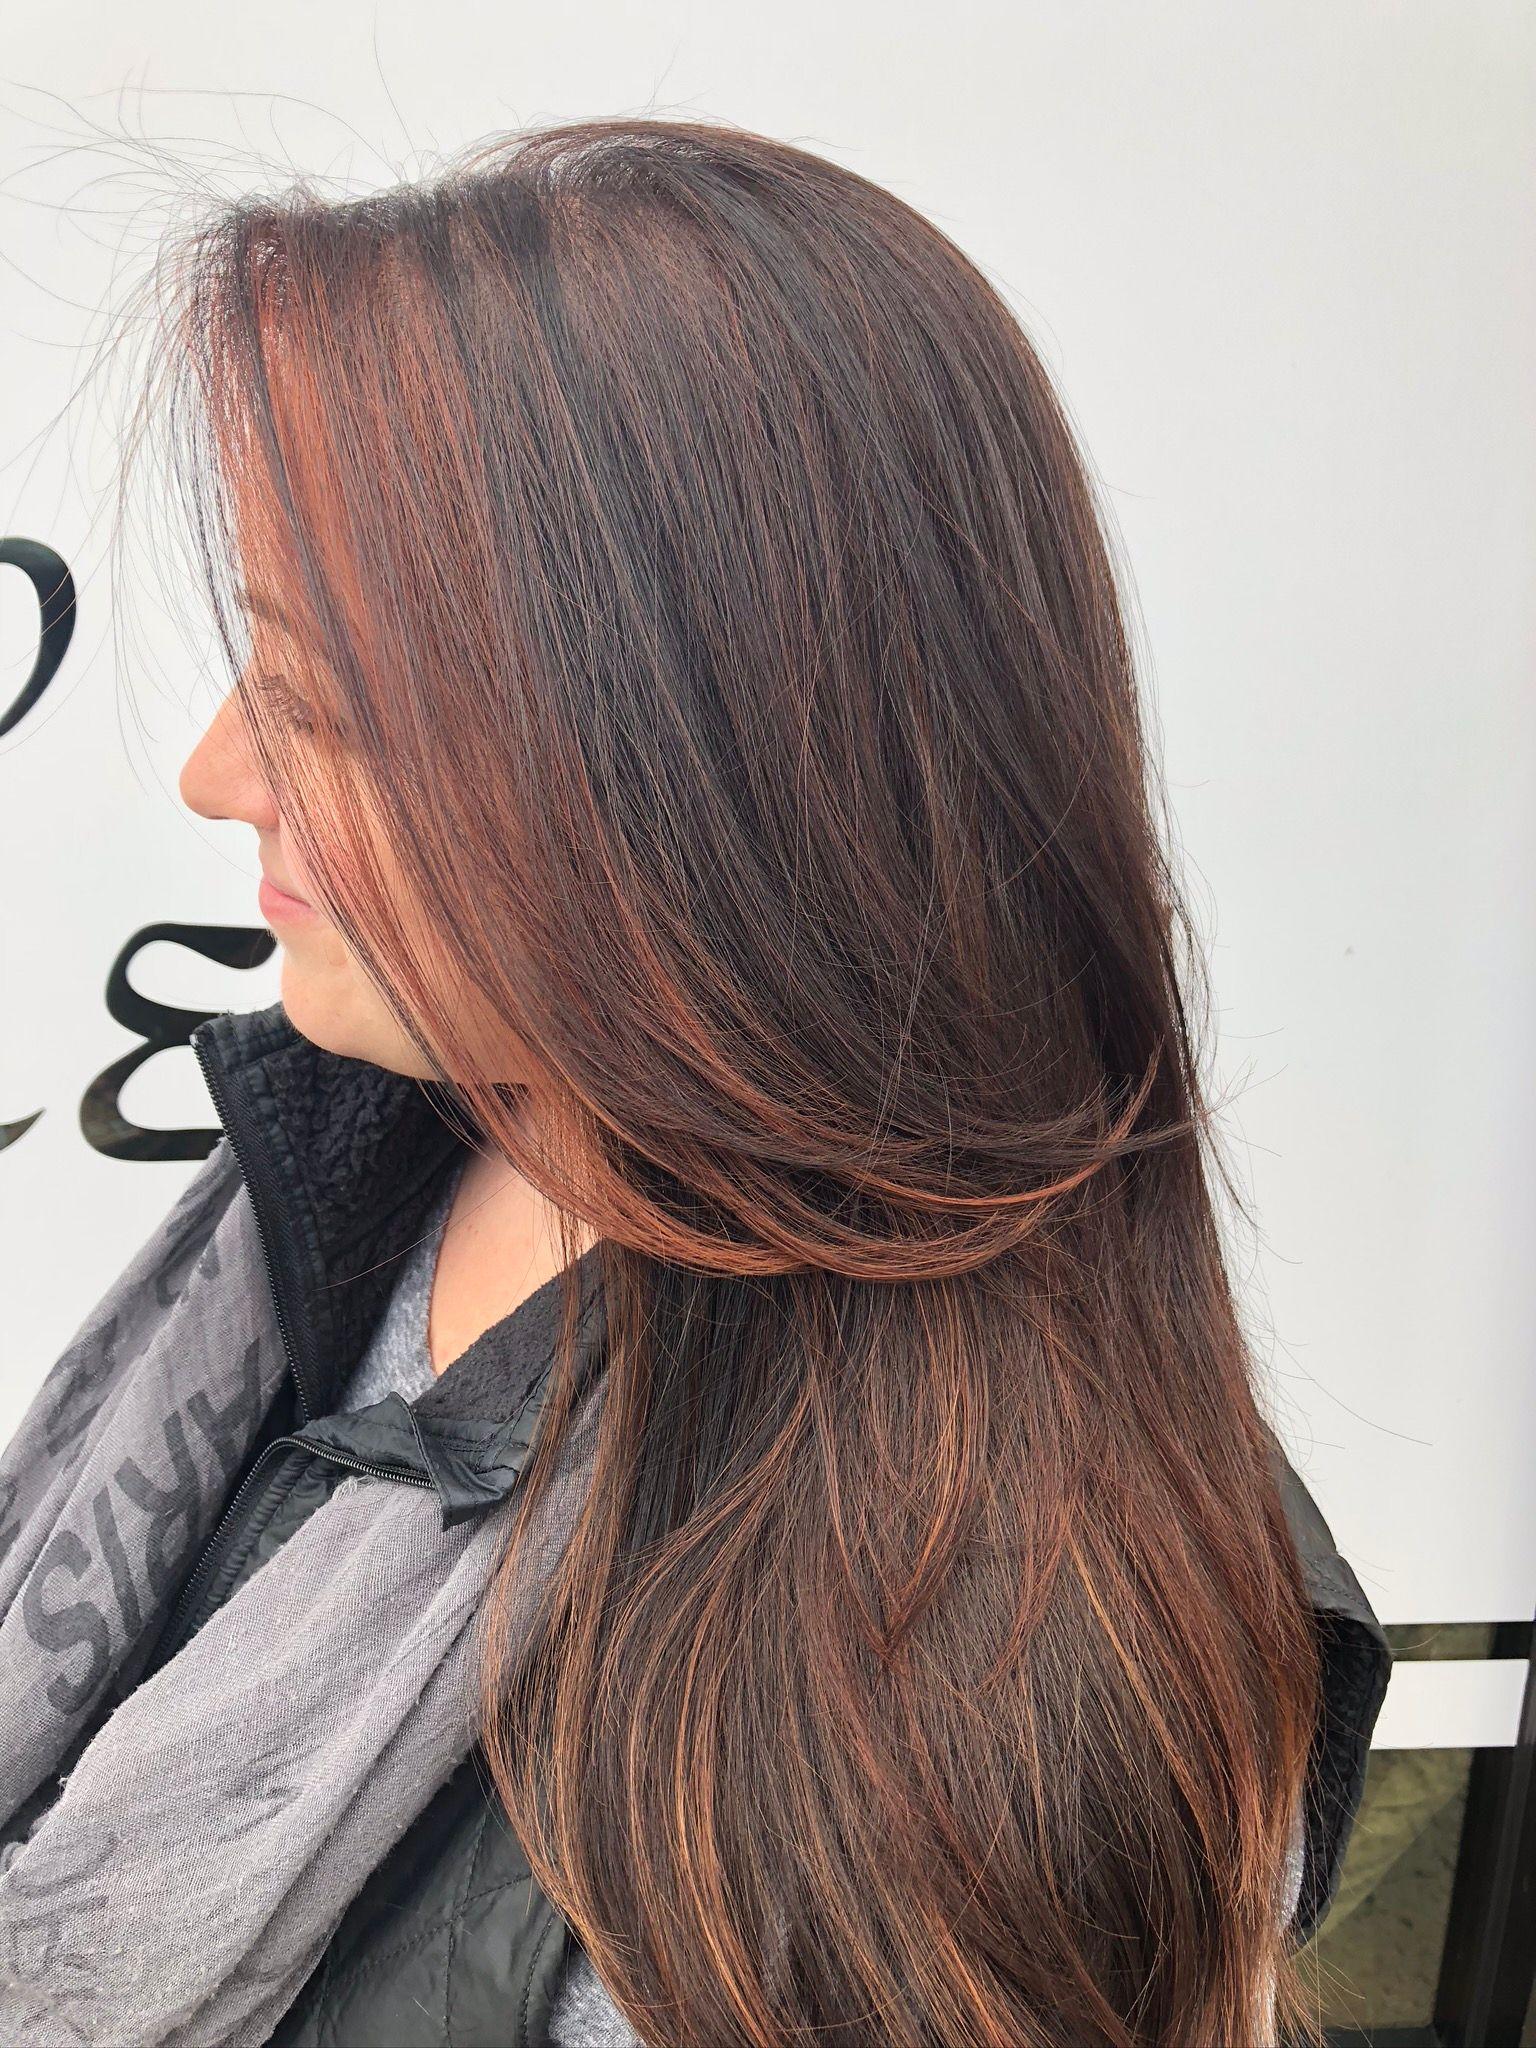 Pin By House Of Excellence Hair Salon On Hair In 2020 Hair Hair Styles Hair Trends